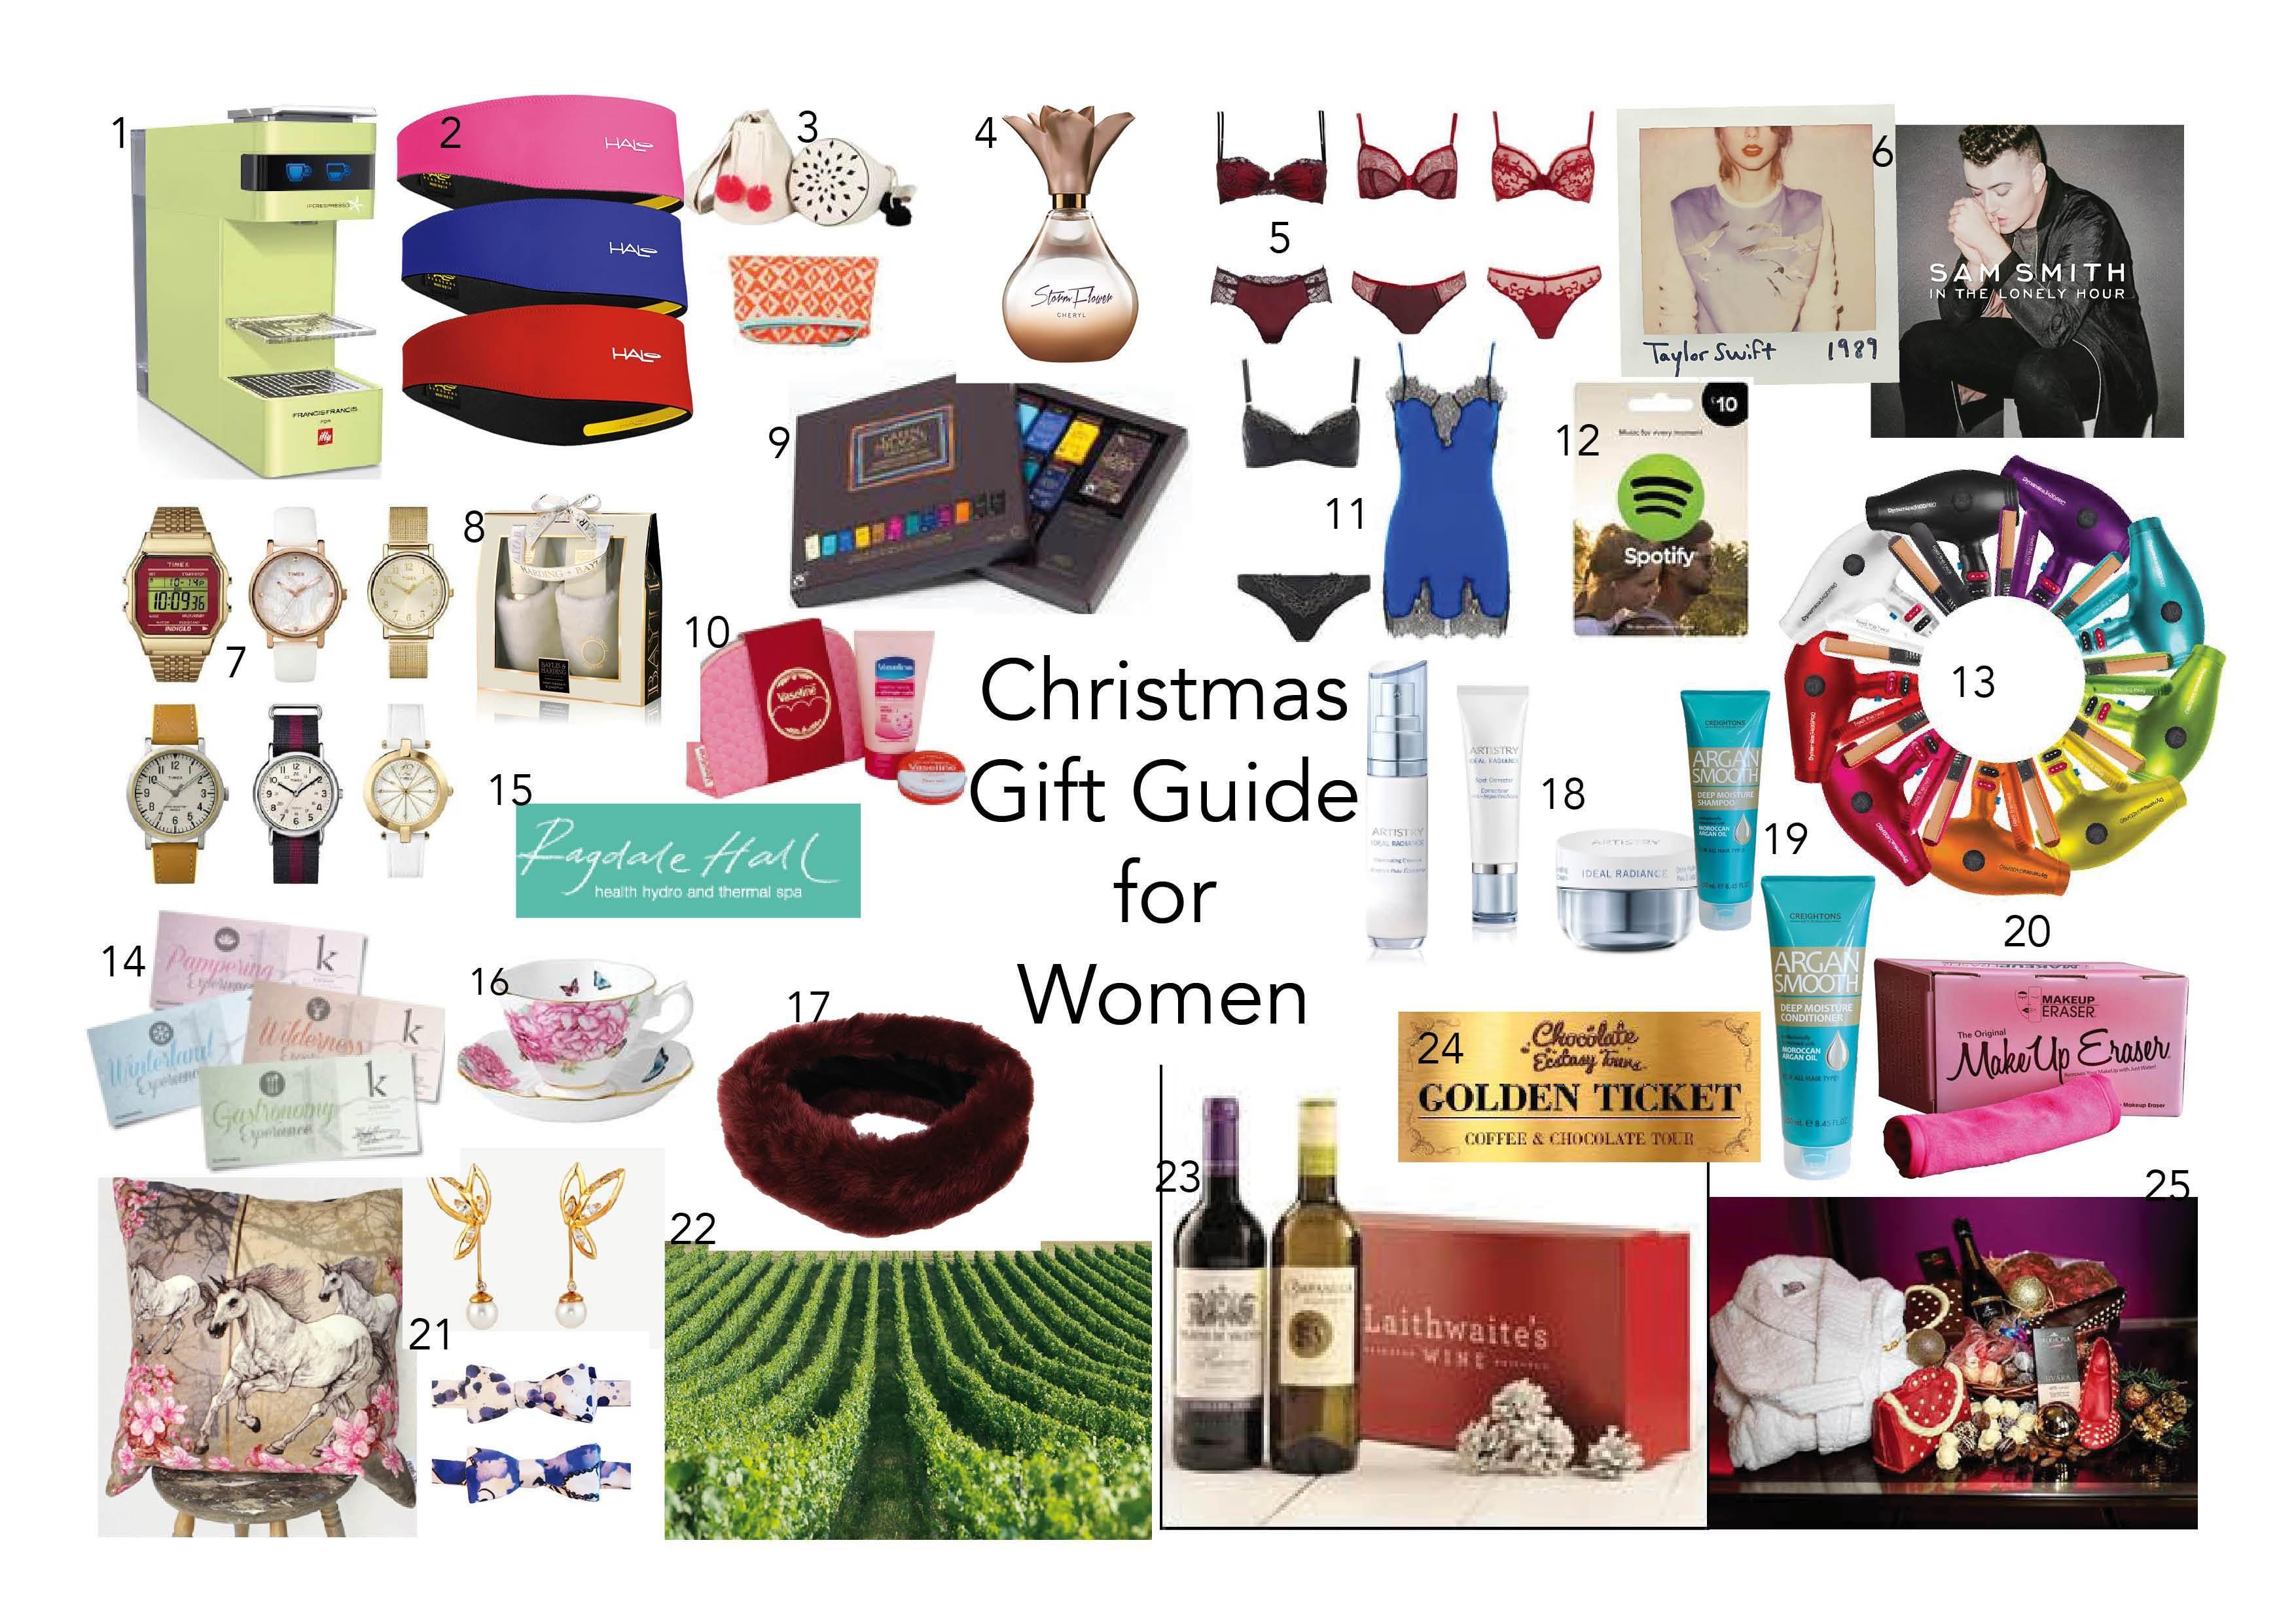 Ladies Christmas Gift Ideas  Miss Stan Smith